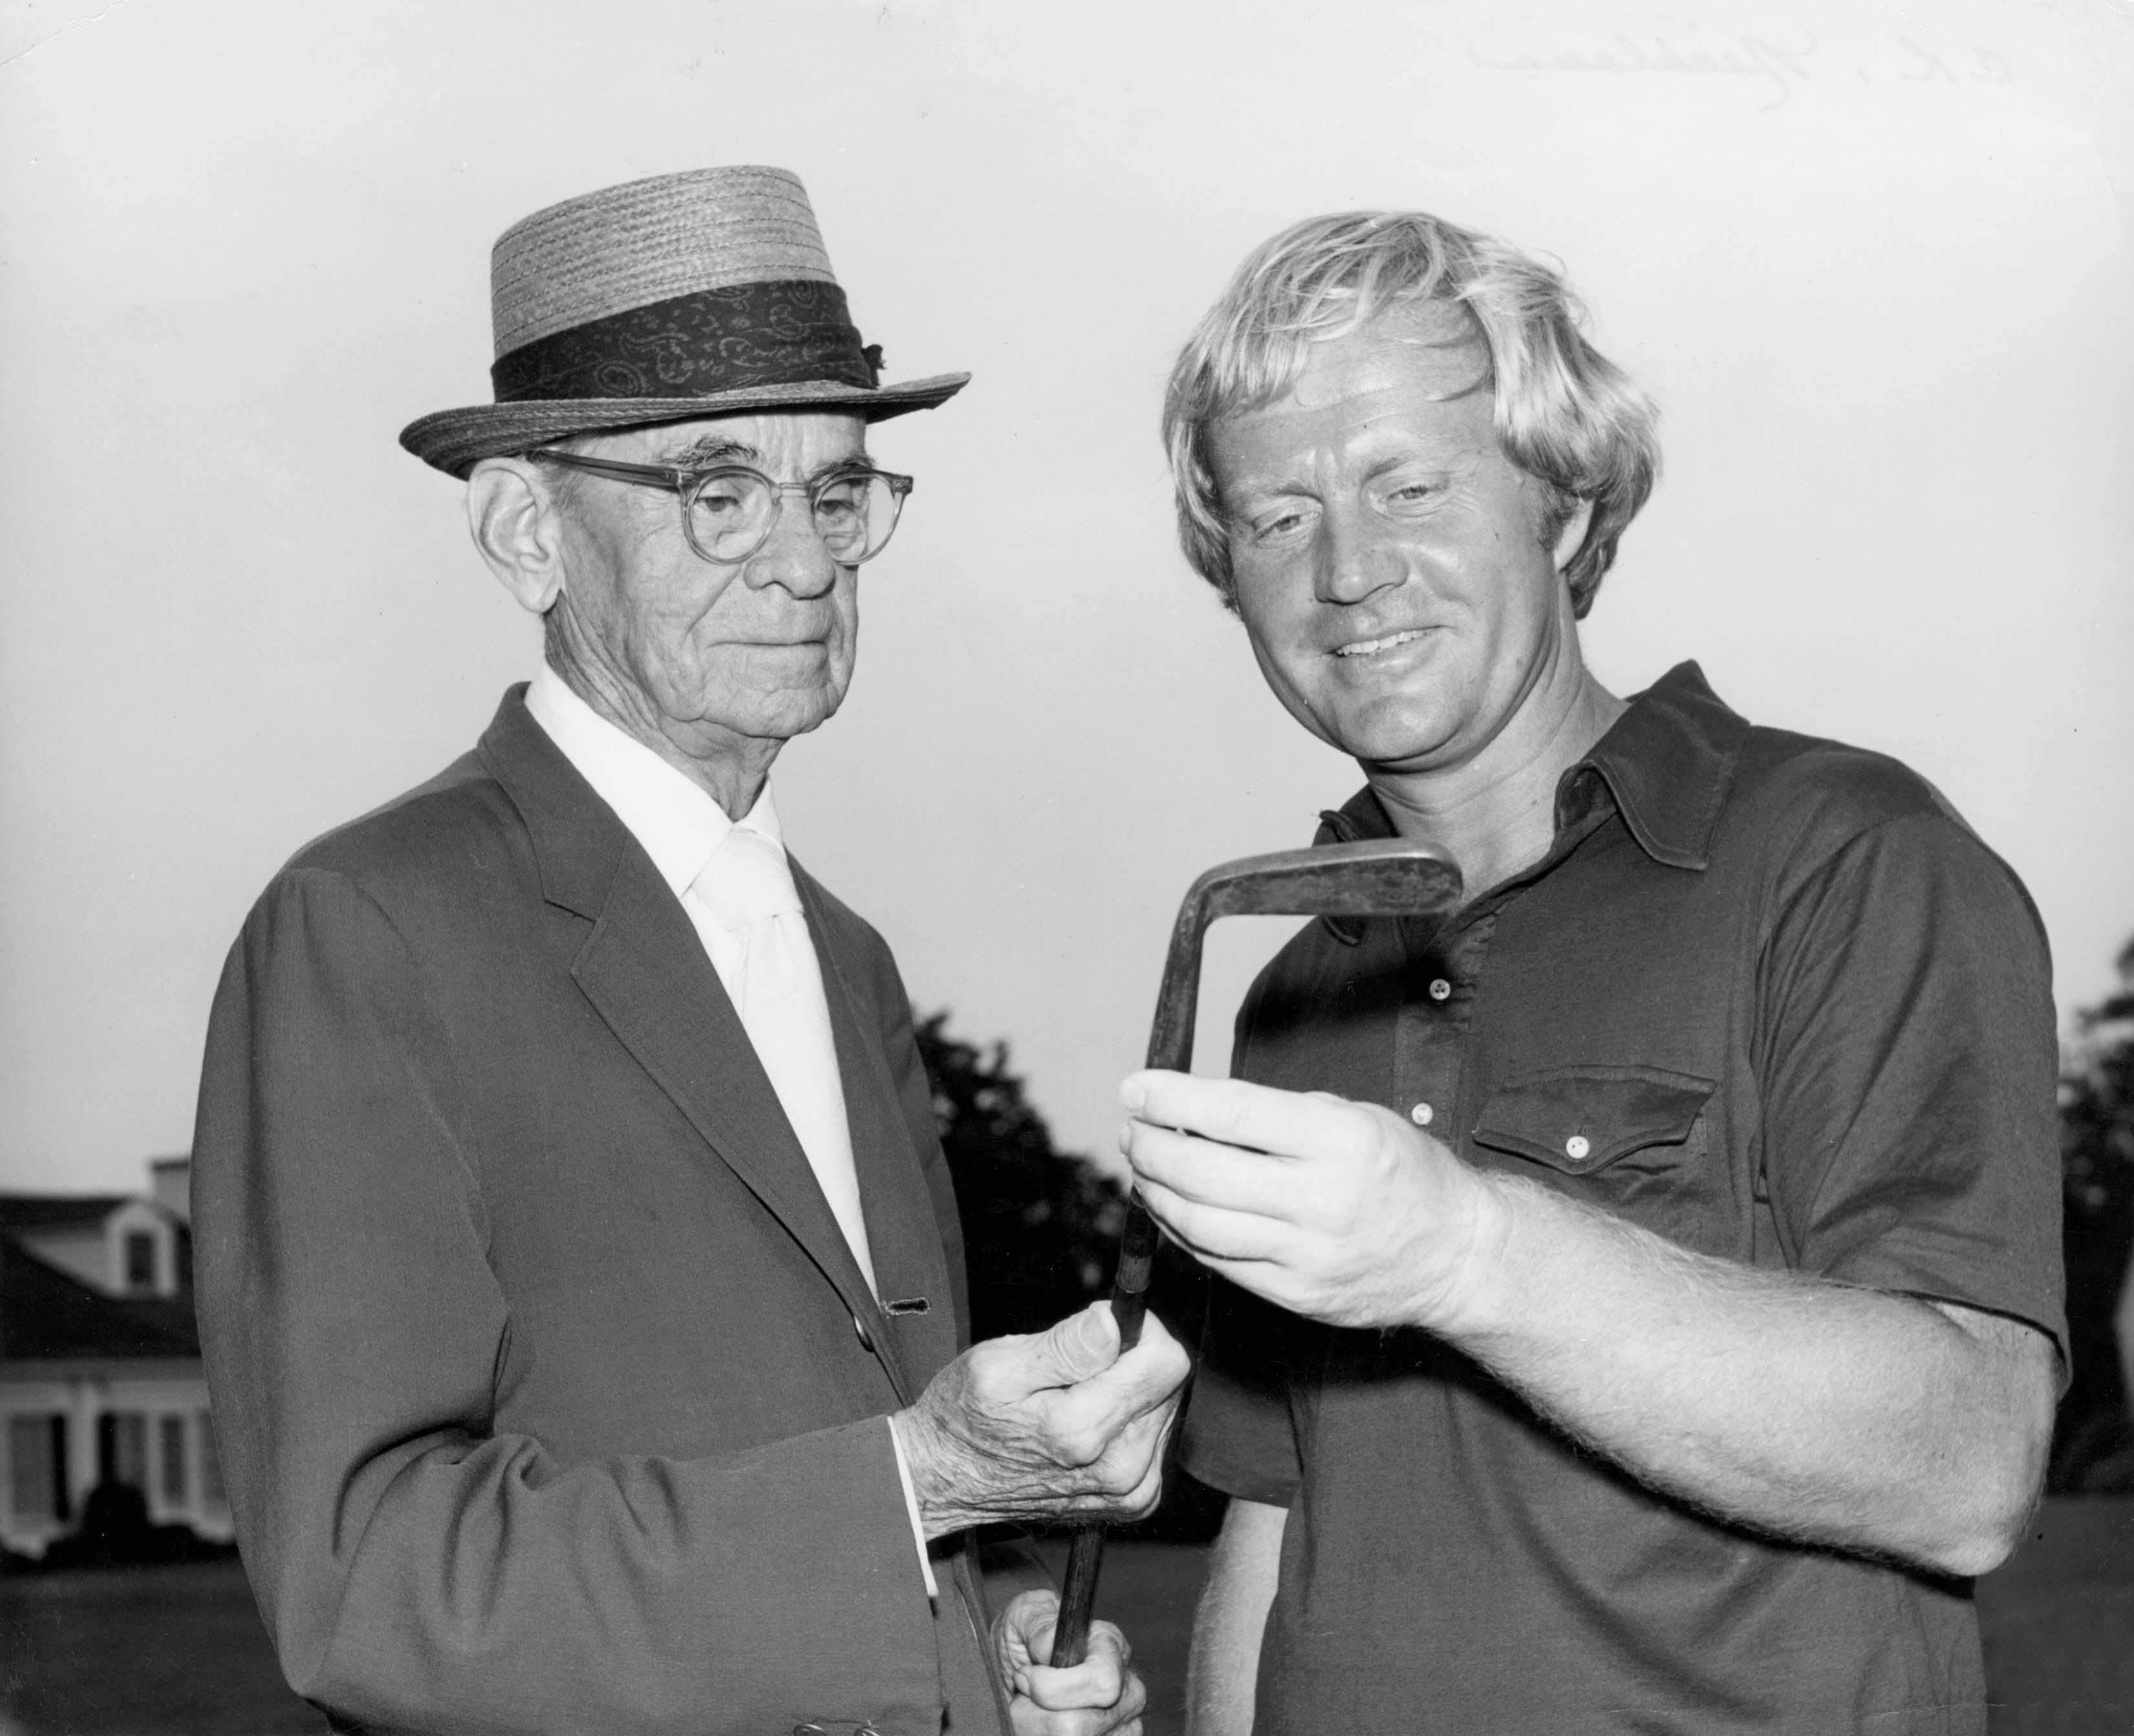 With Clifford Roberts, circa 1970